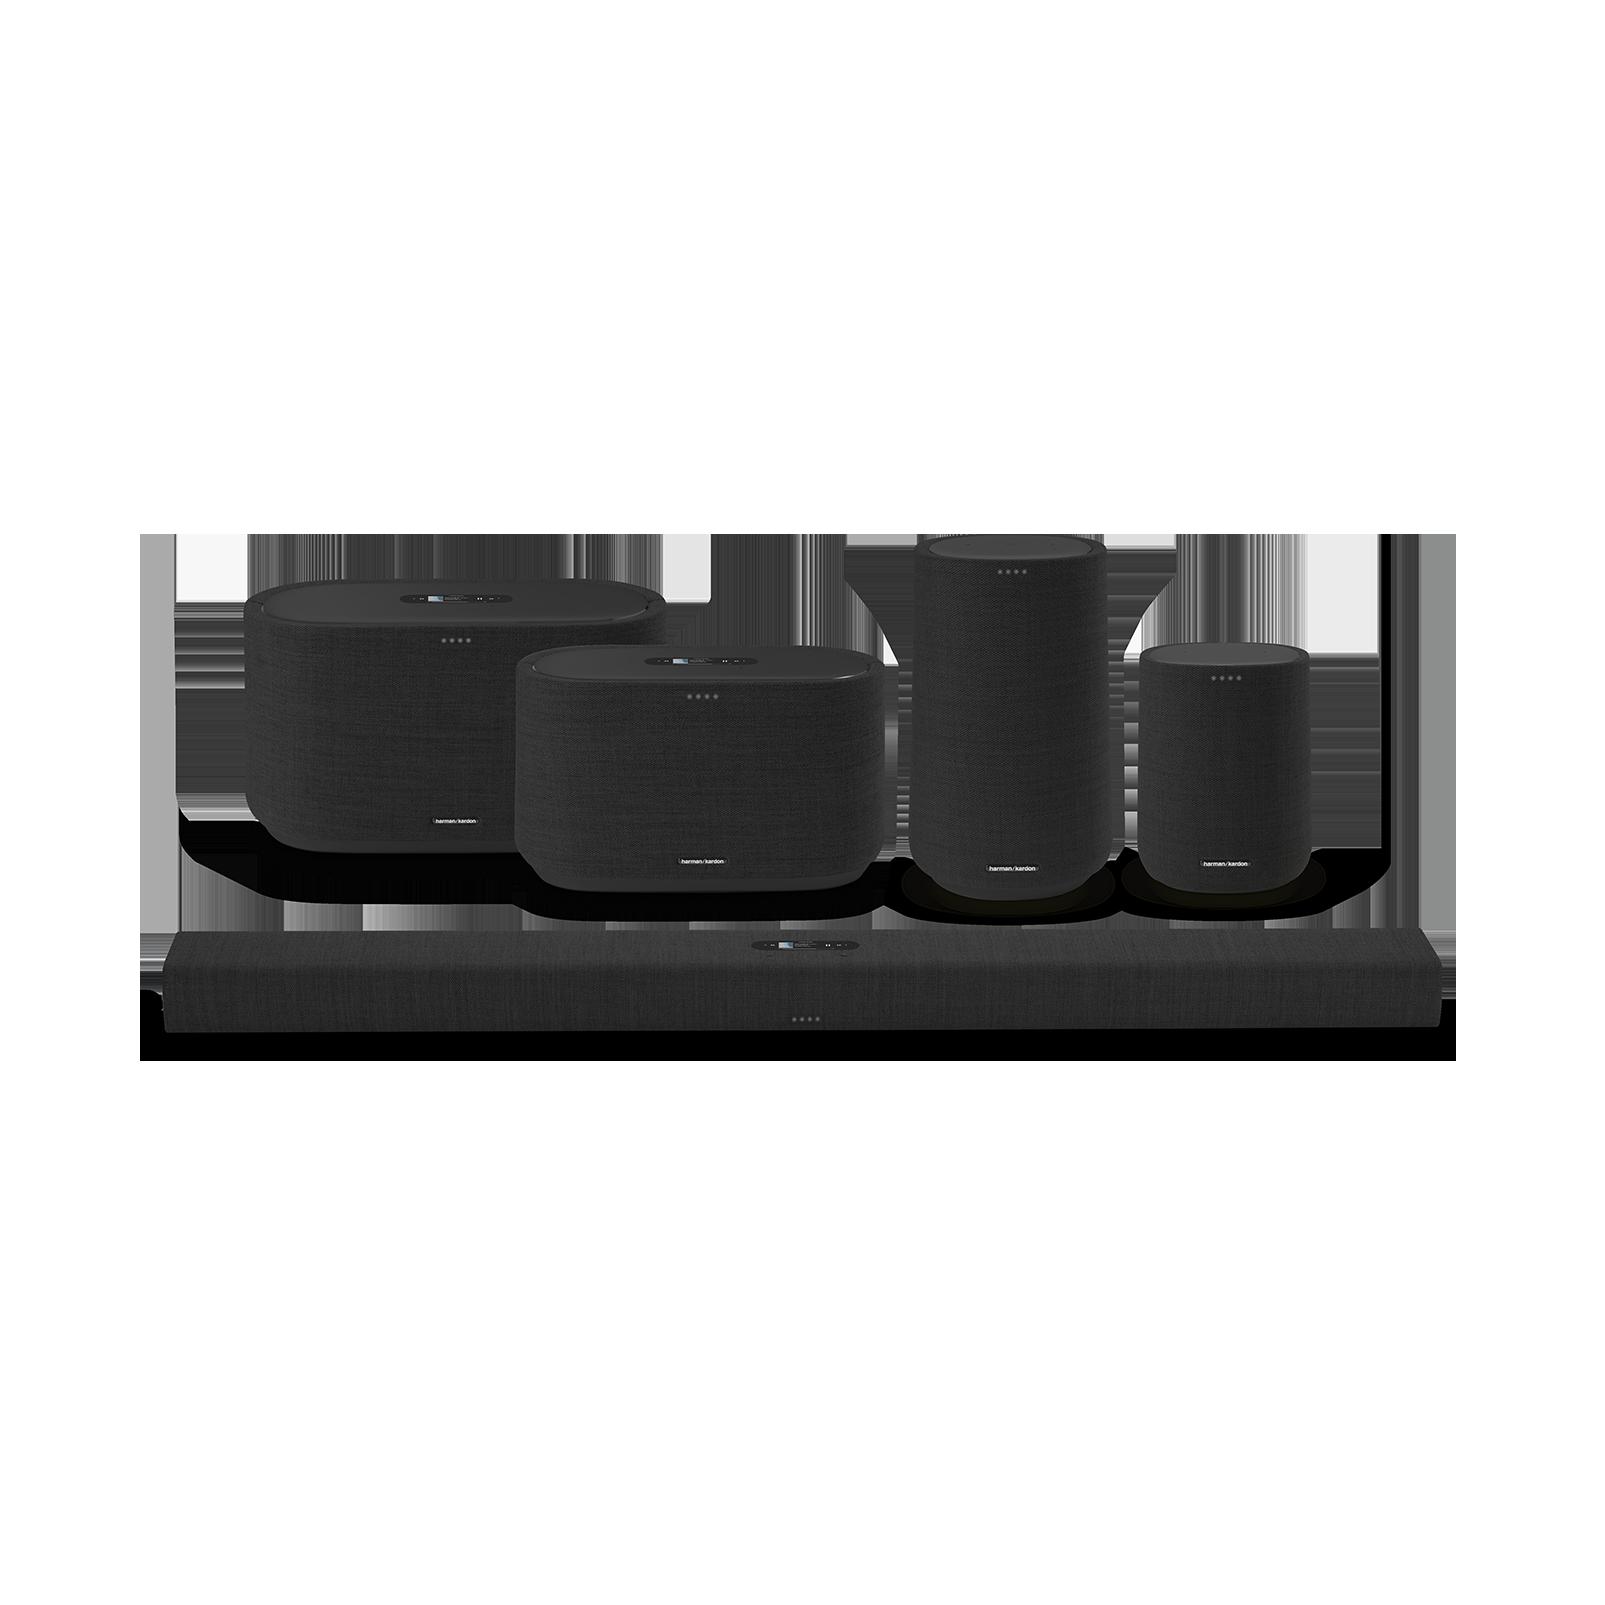 Harman Kardon Citation 100 - Black - The smallest, smartest home speaker with impactful sound - Detailshot 5